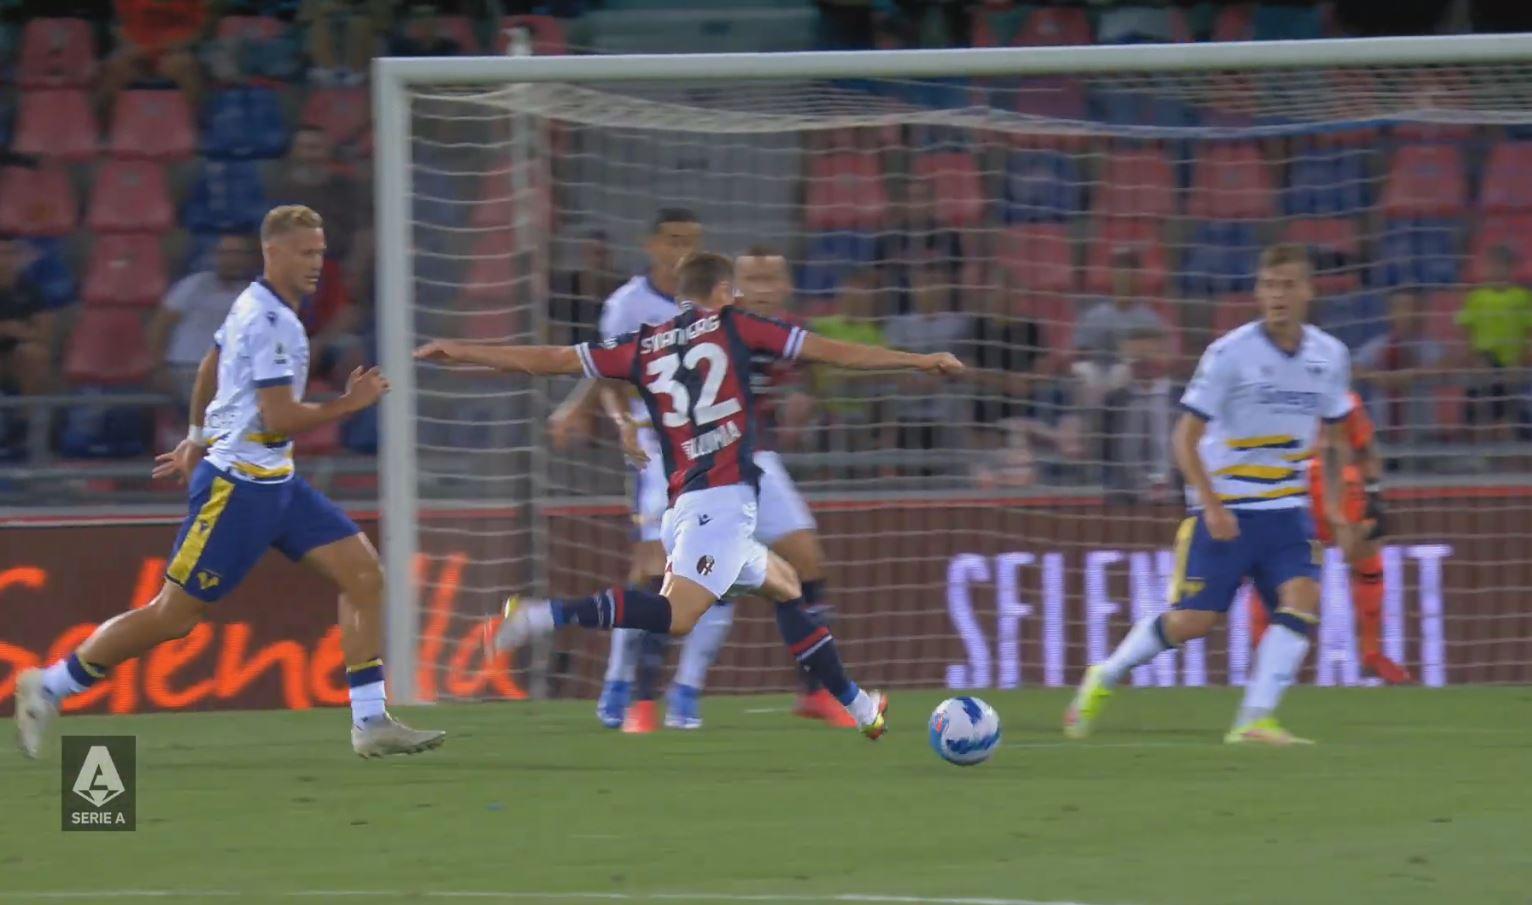 Bologna 1-0 Verona 2021.09.13 (19h45) Full Goals Highlight